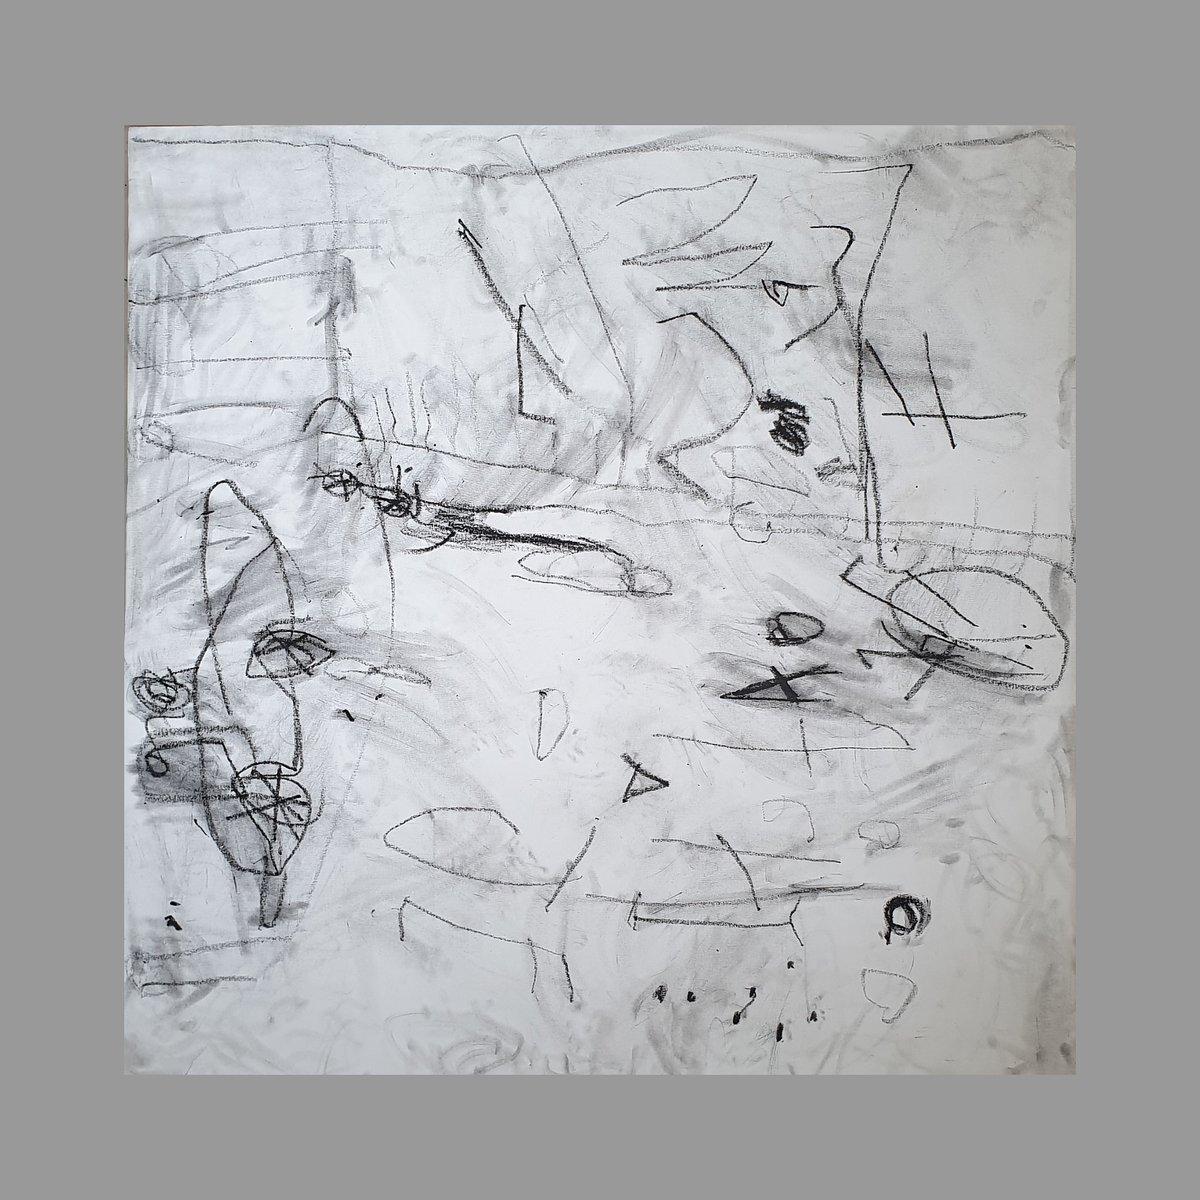 Work on Canvas . 2020. #canvas #abstractpaintings #abstractexpressionism #abstractexpressionist #instaartoftheday #instaabstract #minimal #indianartist #modernart #Ahmedabad #indianart #ajaychoudhary #originalartworkforsale #artbuyer #MOMA #met #louvre #artcollectorworldpic.twitter.com/LG6dqDAuja